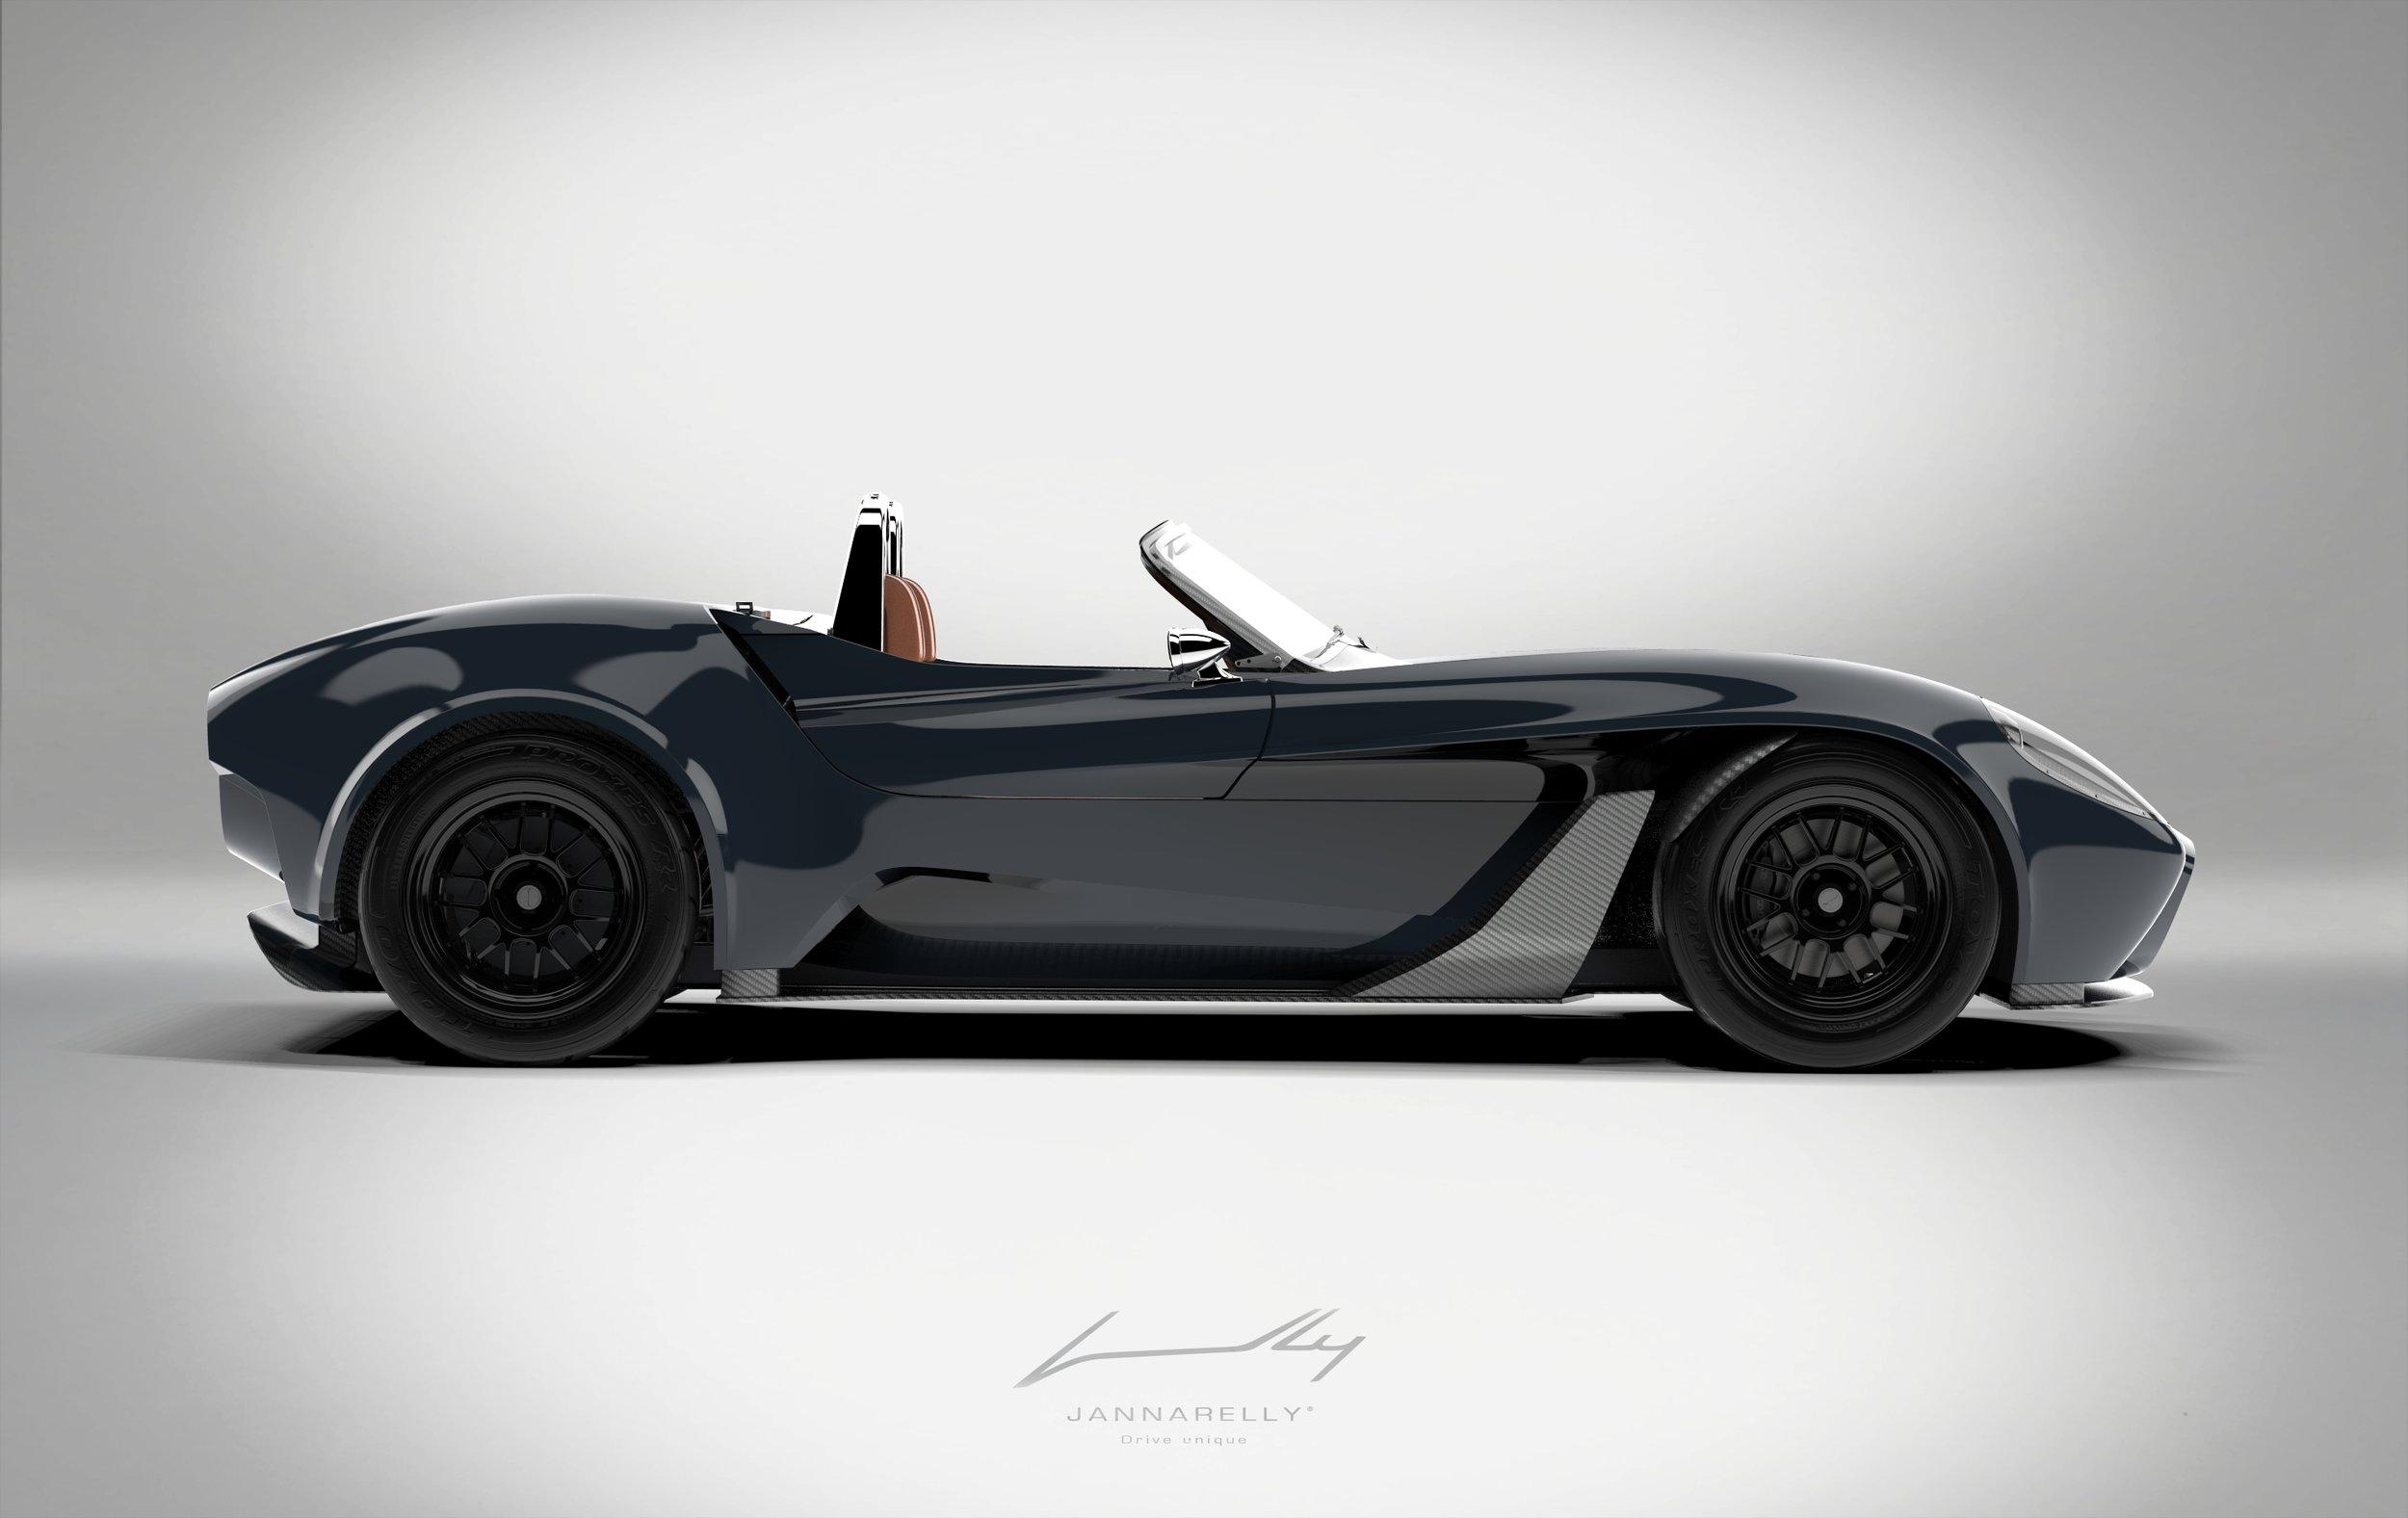 J design1 roadster.312.jpg